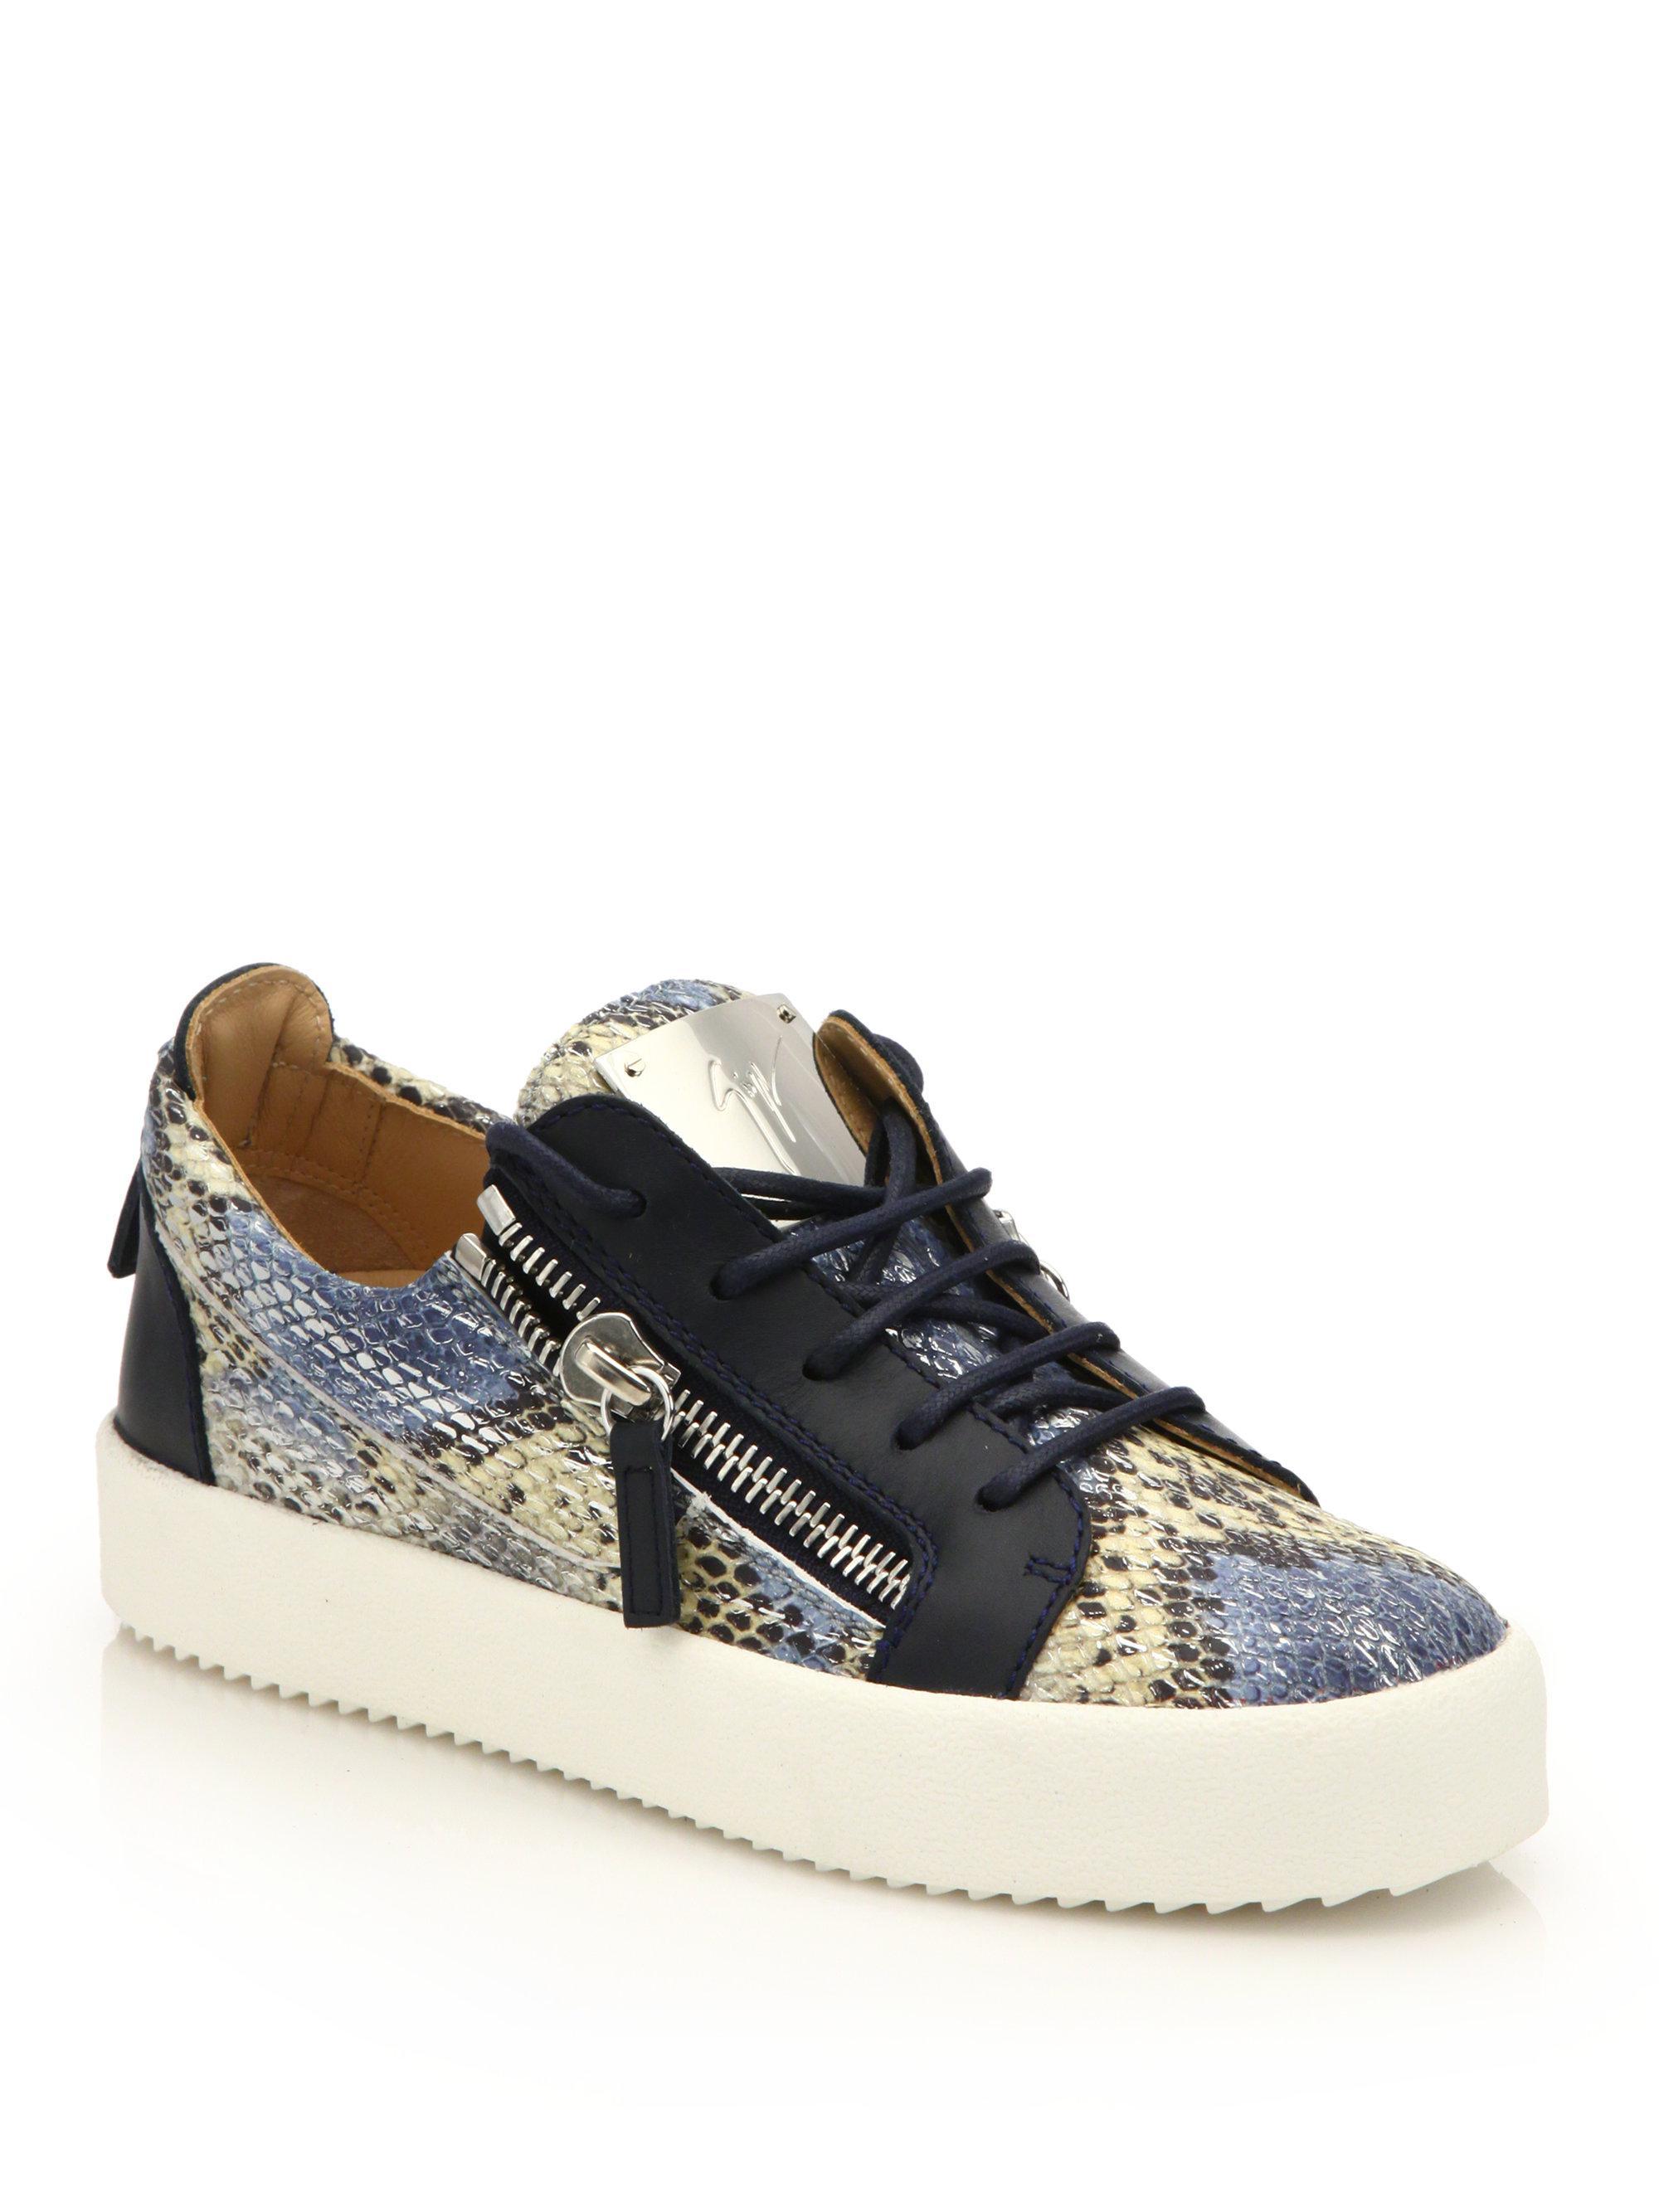 Giuseppe Zanotti. Women's Snake-embossed Leather Low-top Zip Sneakers